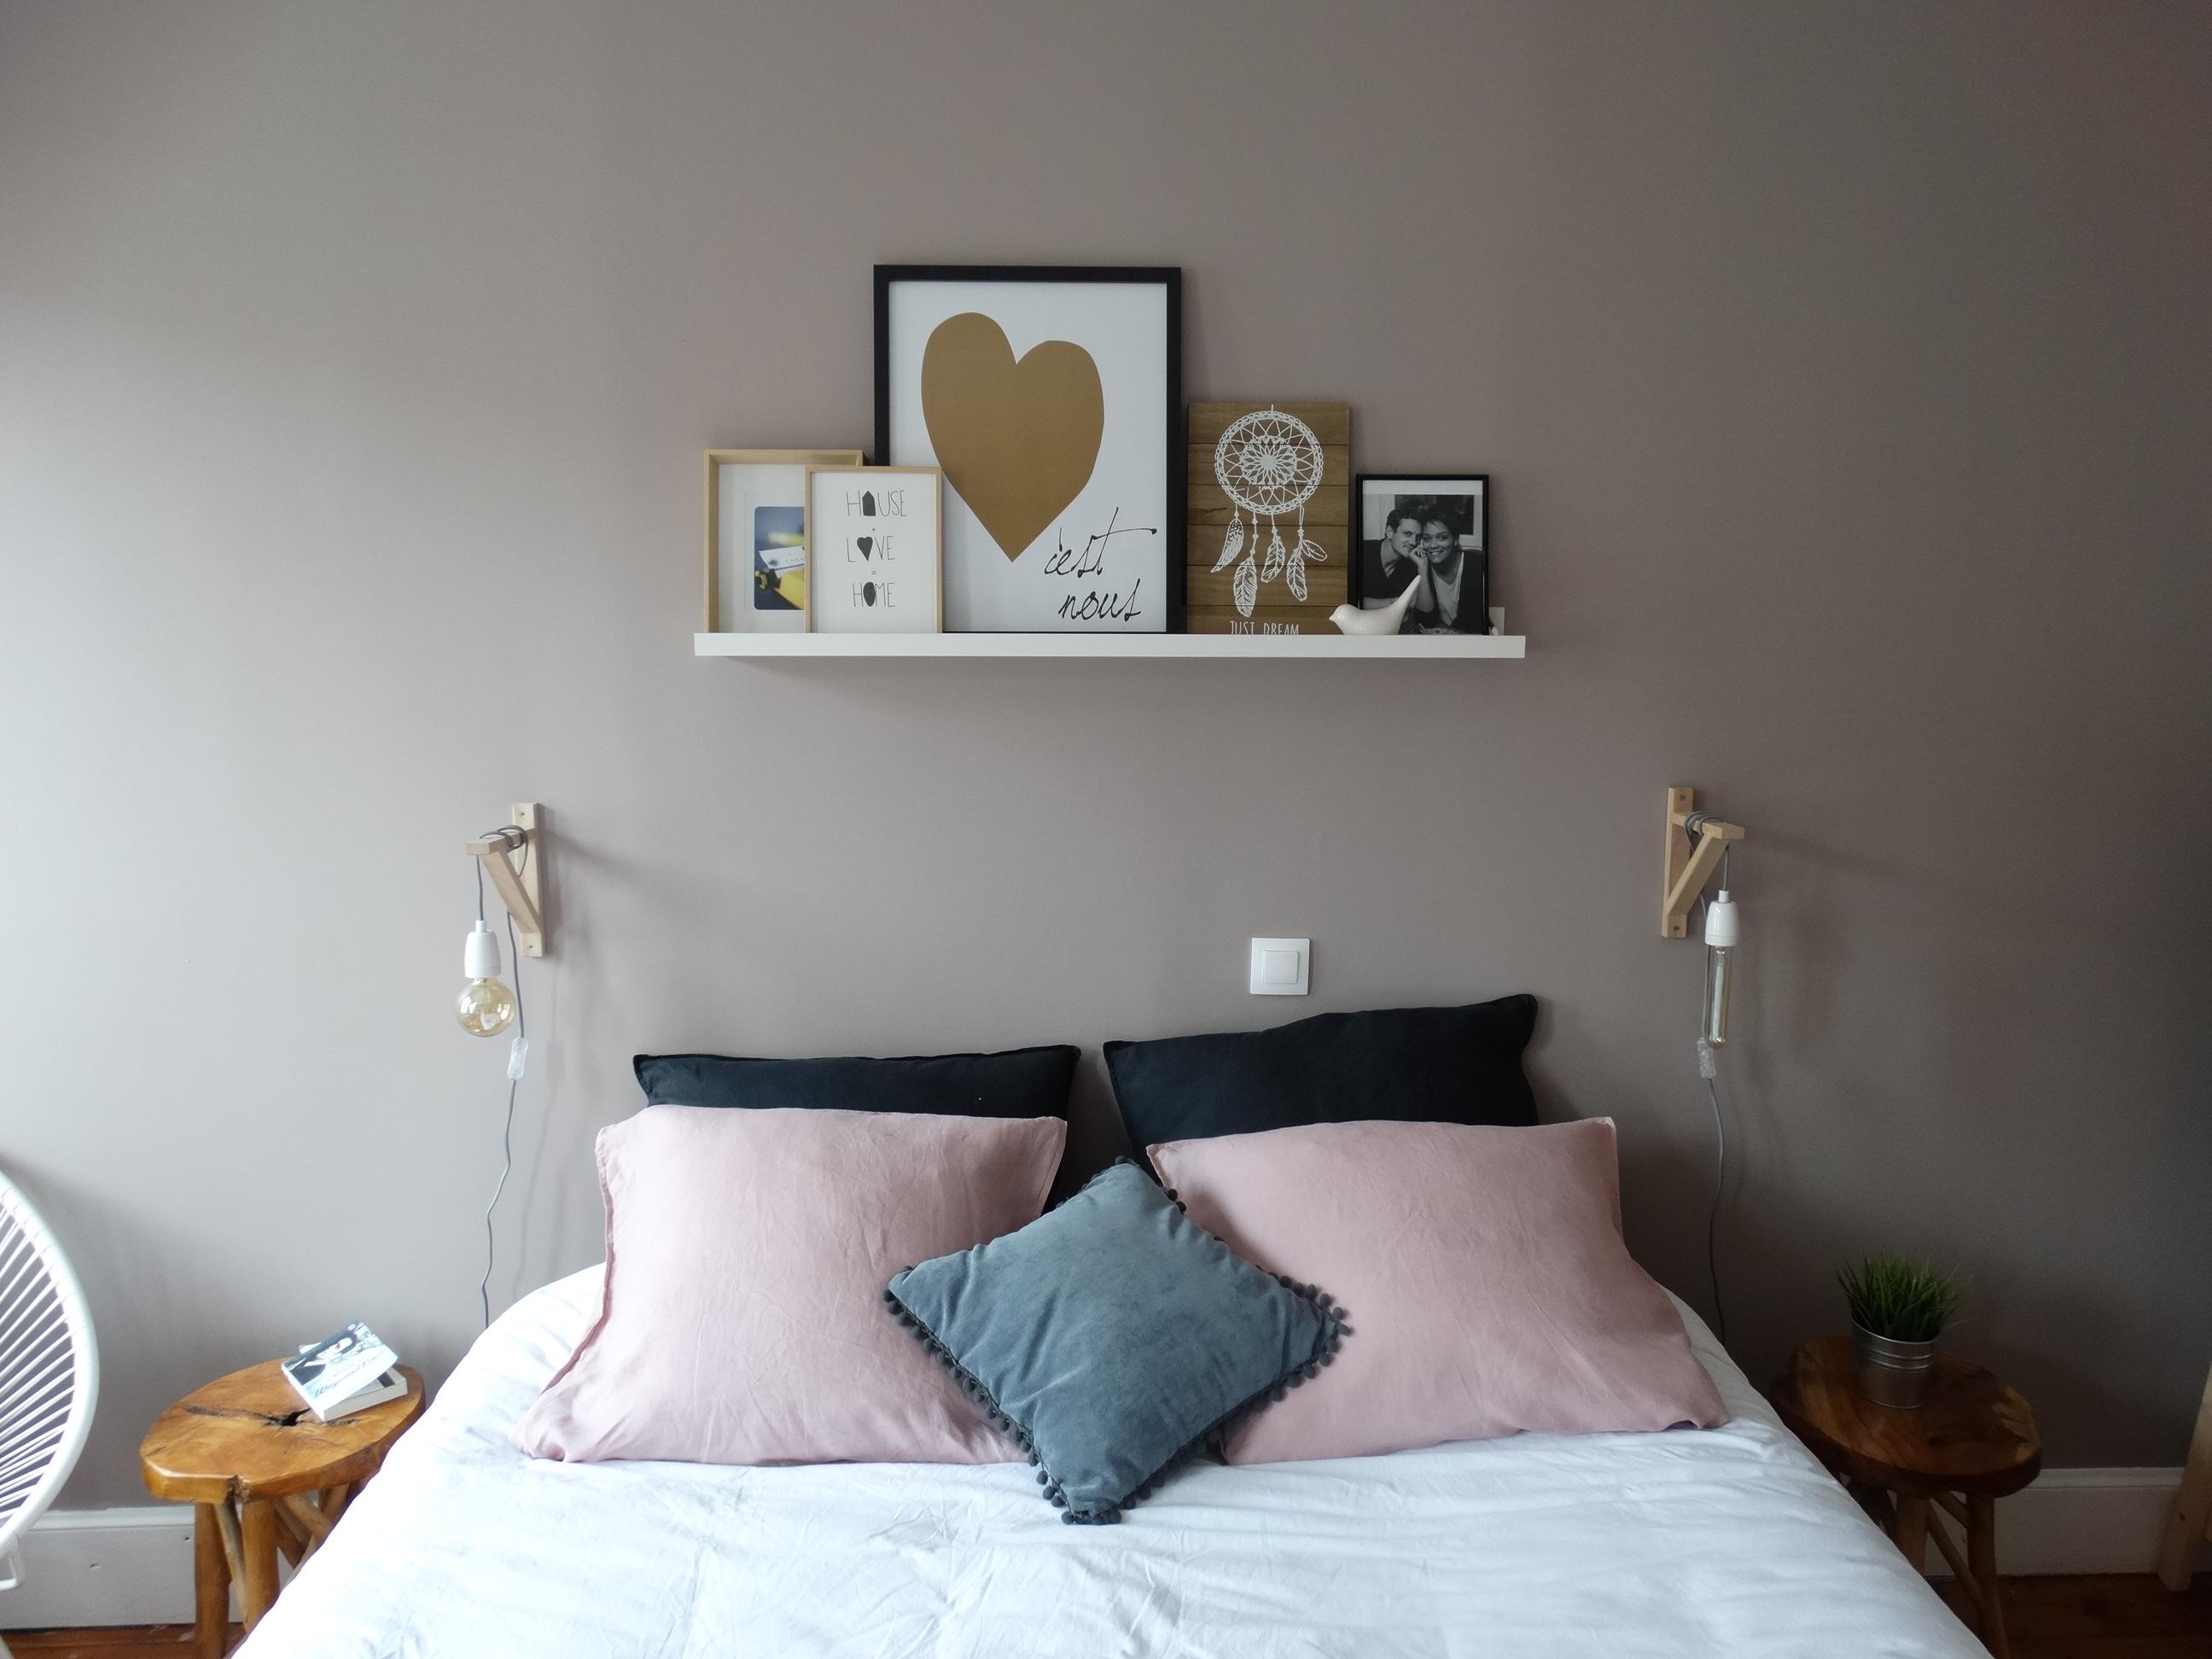 cimaises pour tableaux ikea ww06 humatraffin. Black Bedroom Furniture Sets. Home Design Ideas